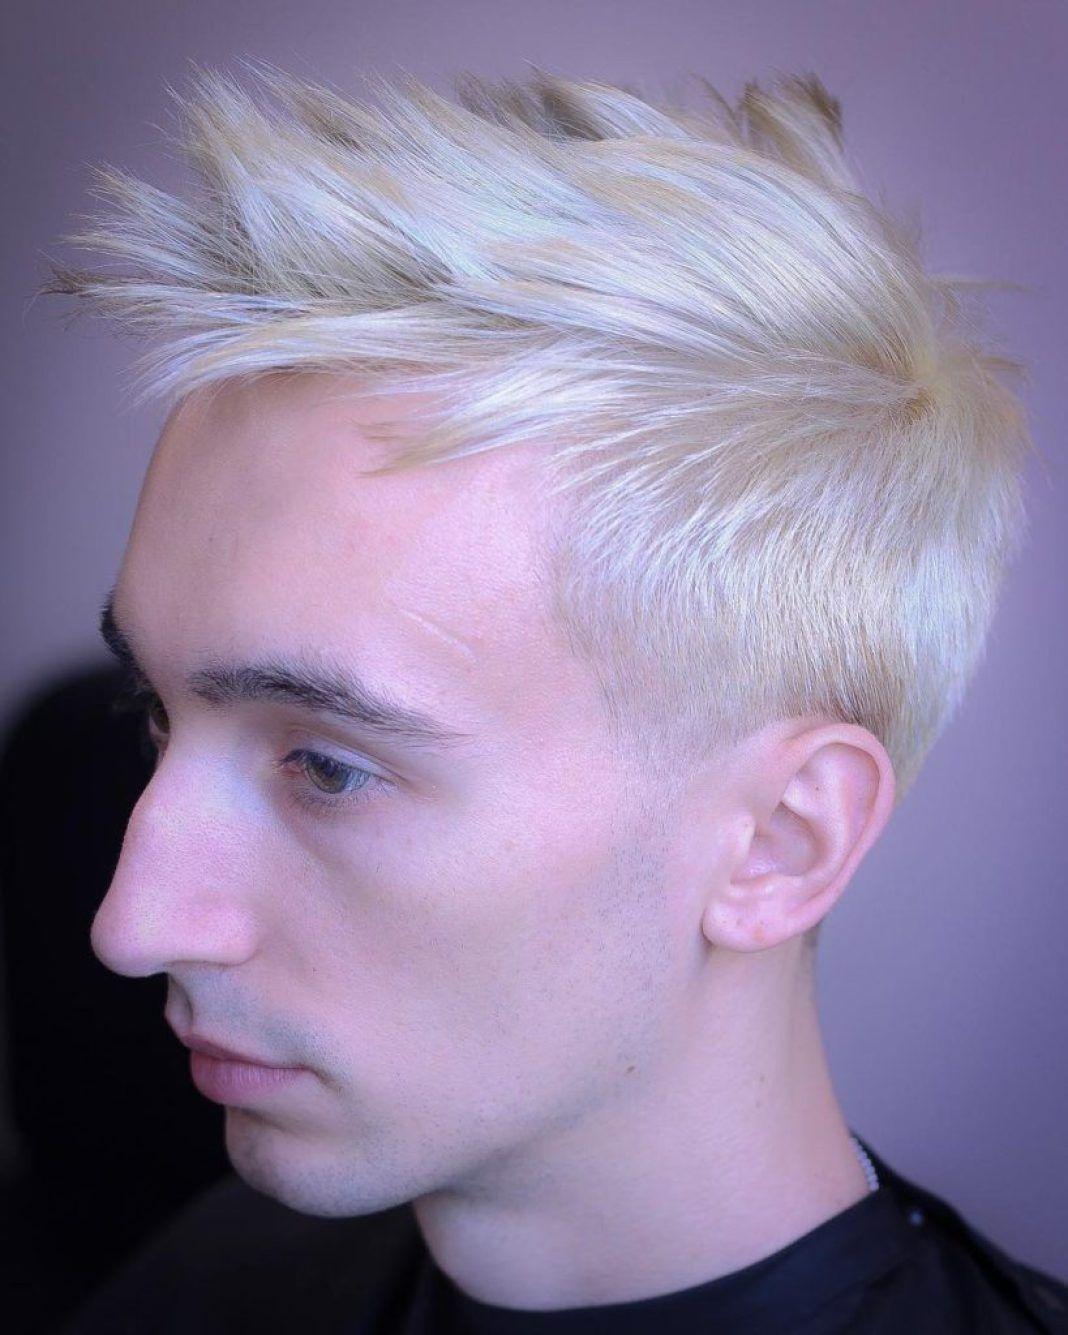 Menus hair color ideas for new look in hair pinterest